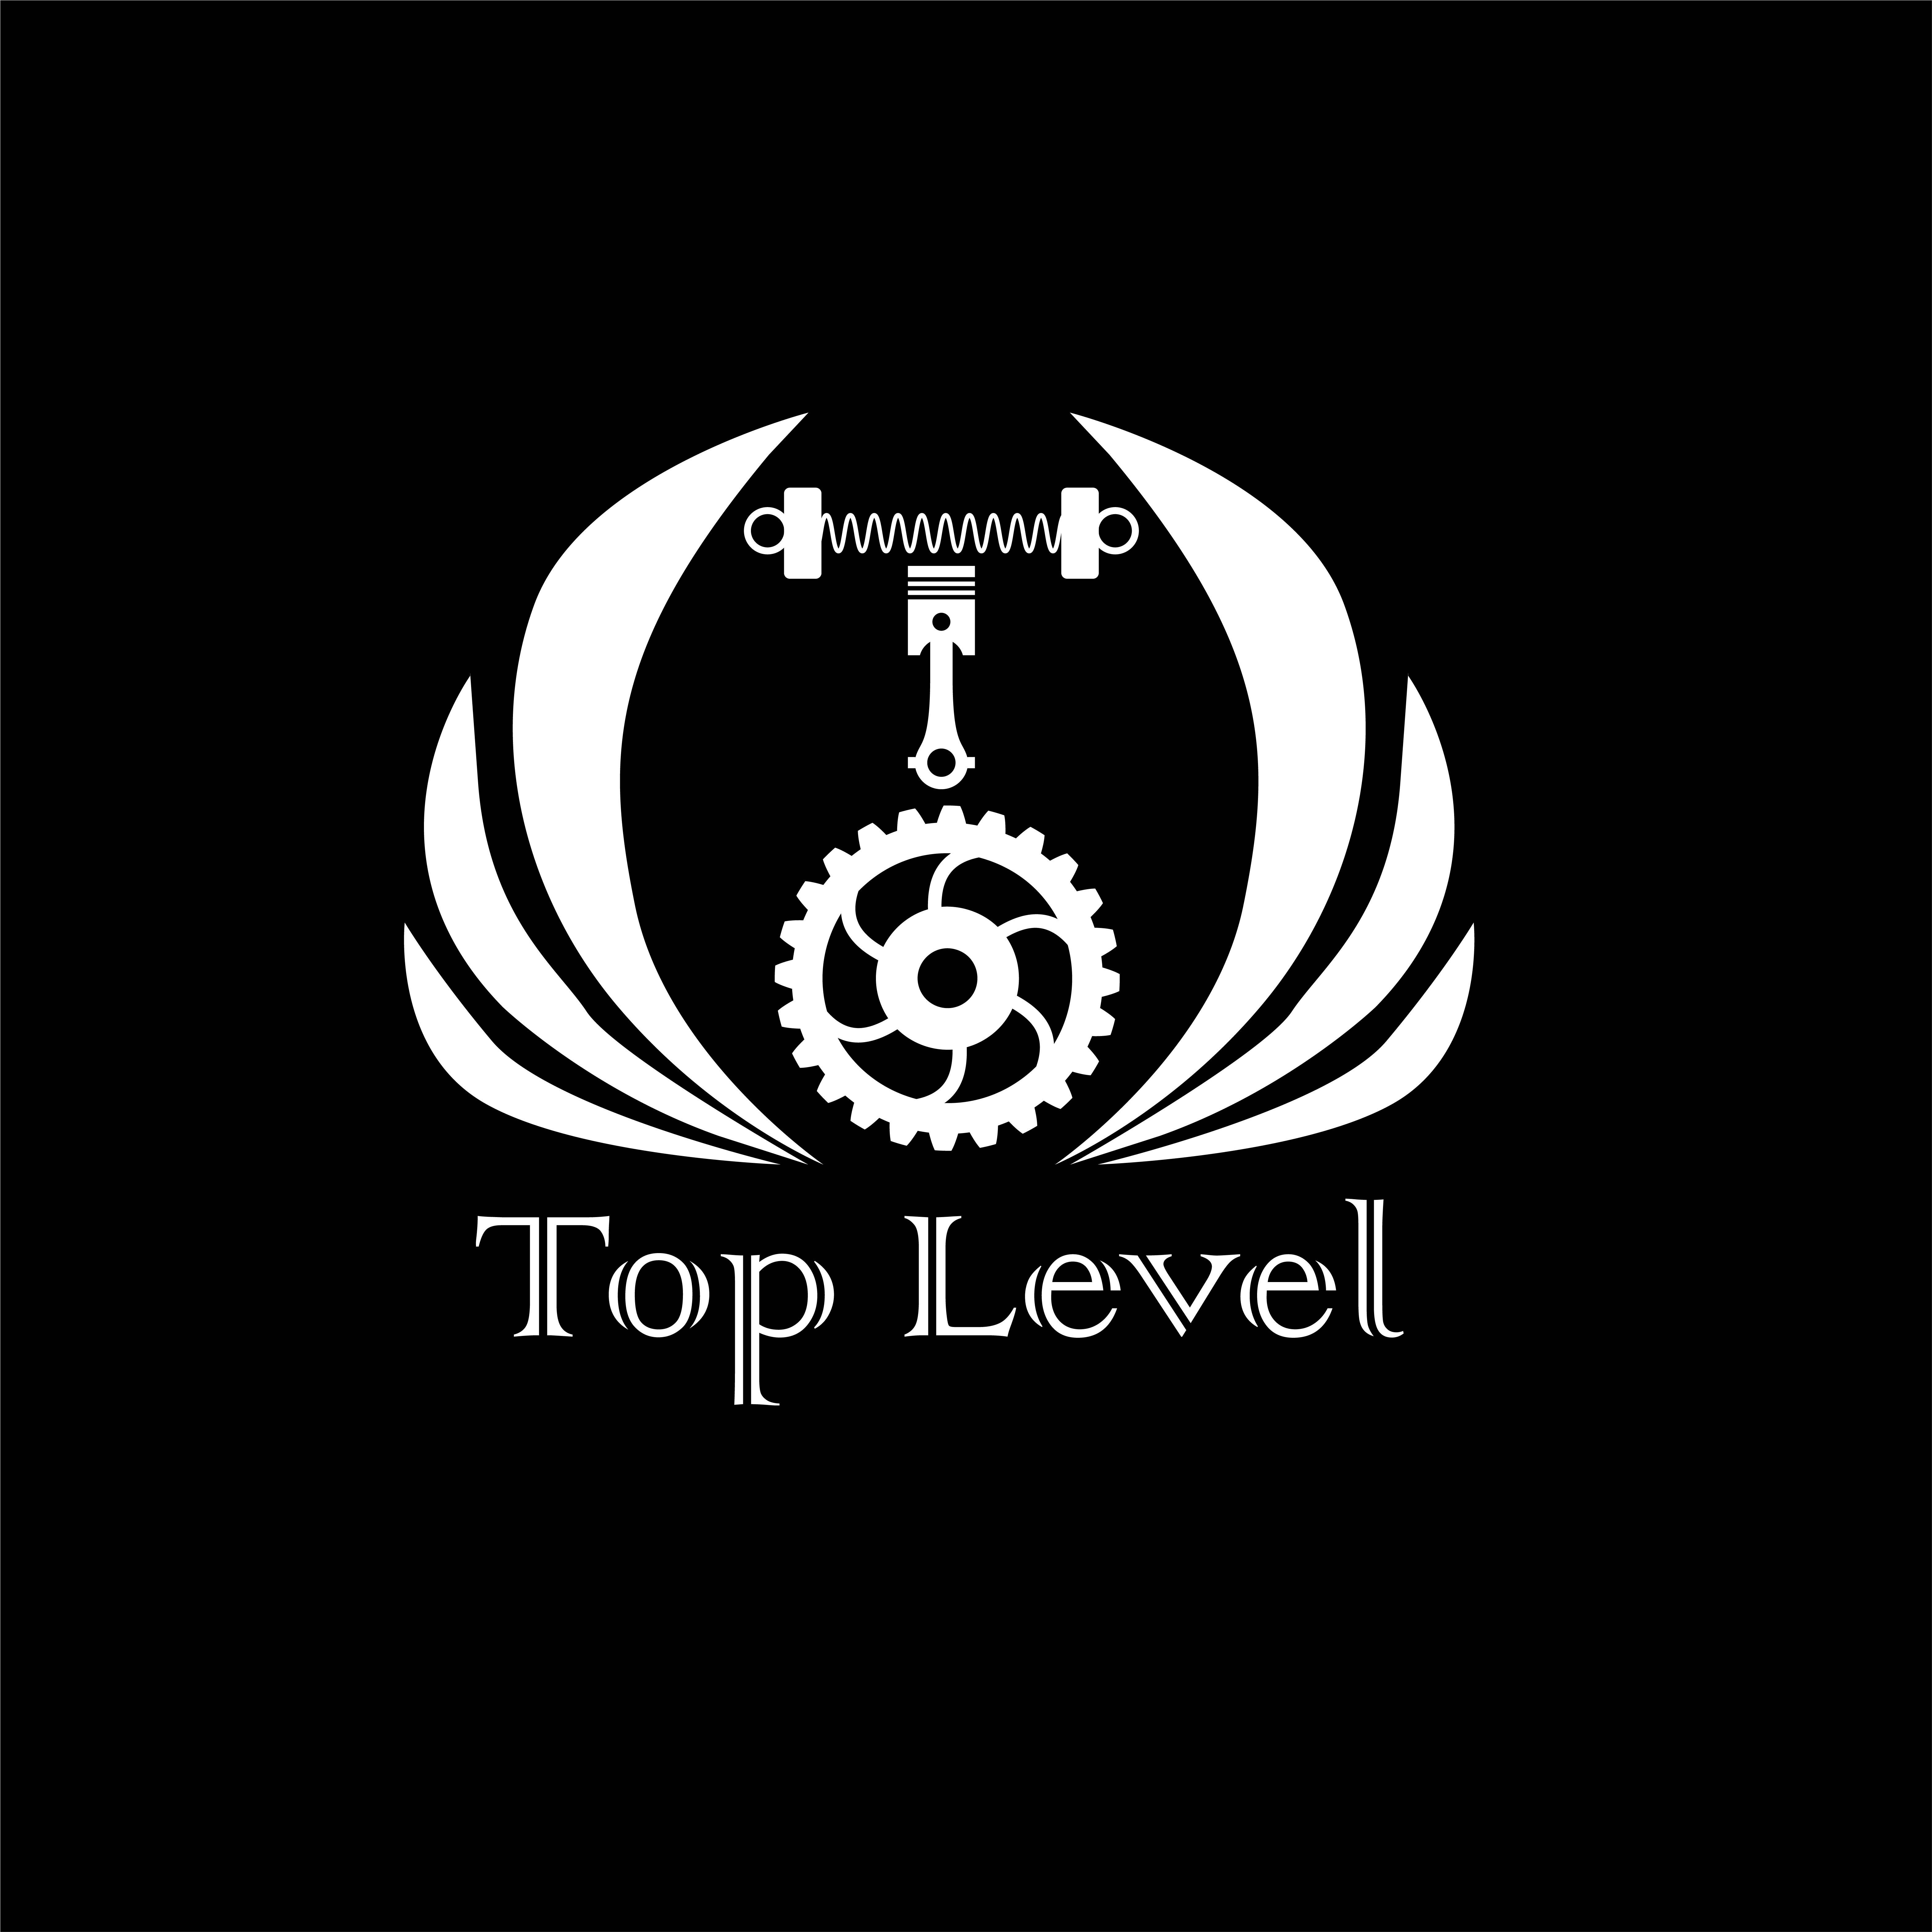 Разработка логотипа для тюнинг ателье фото f_4295f45ba429aa37.jpg